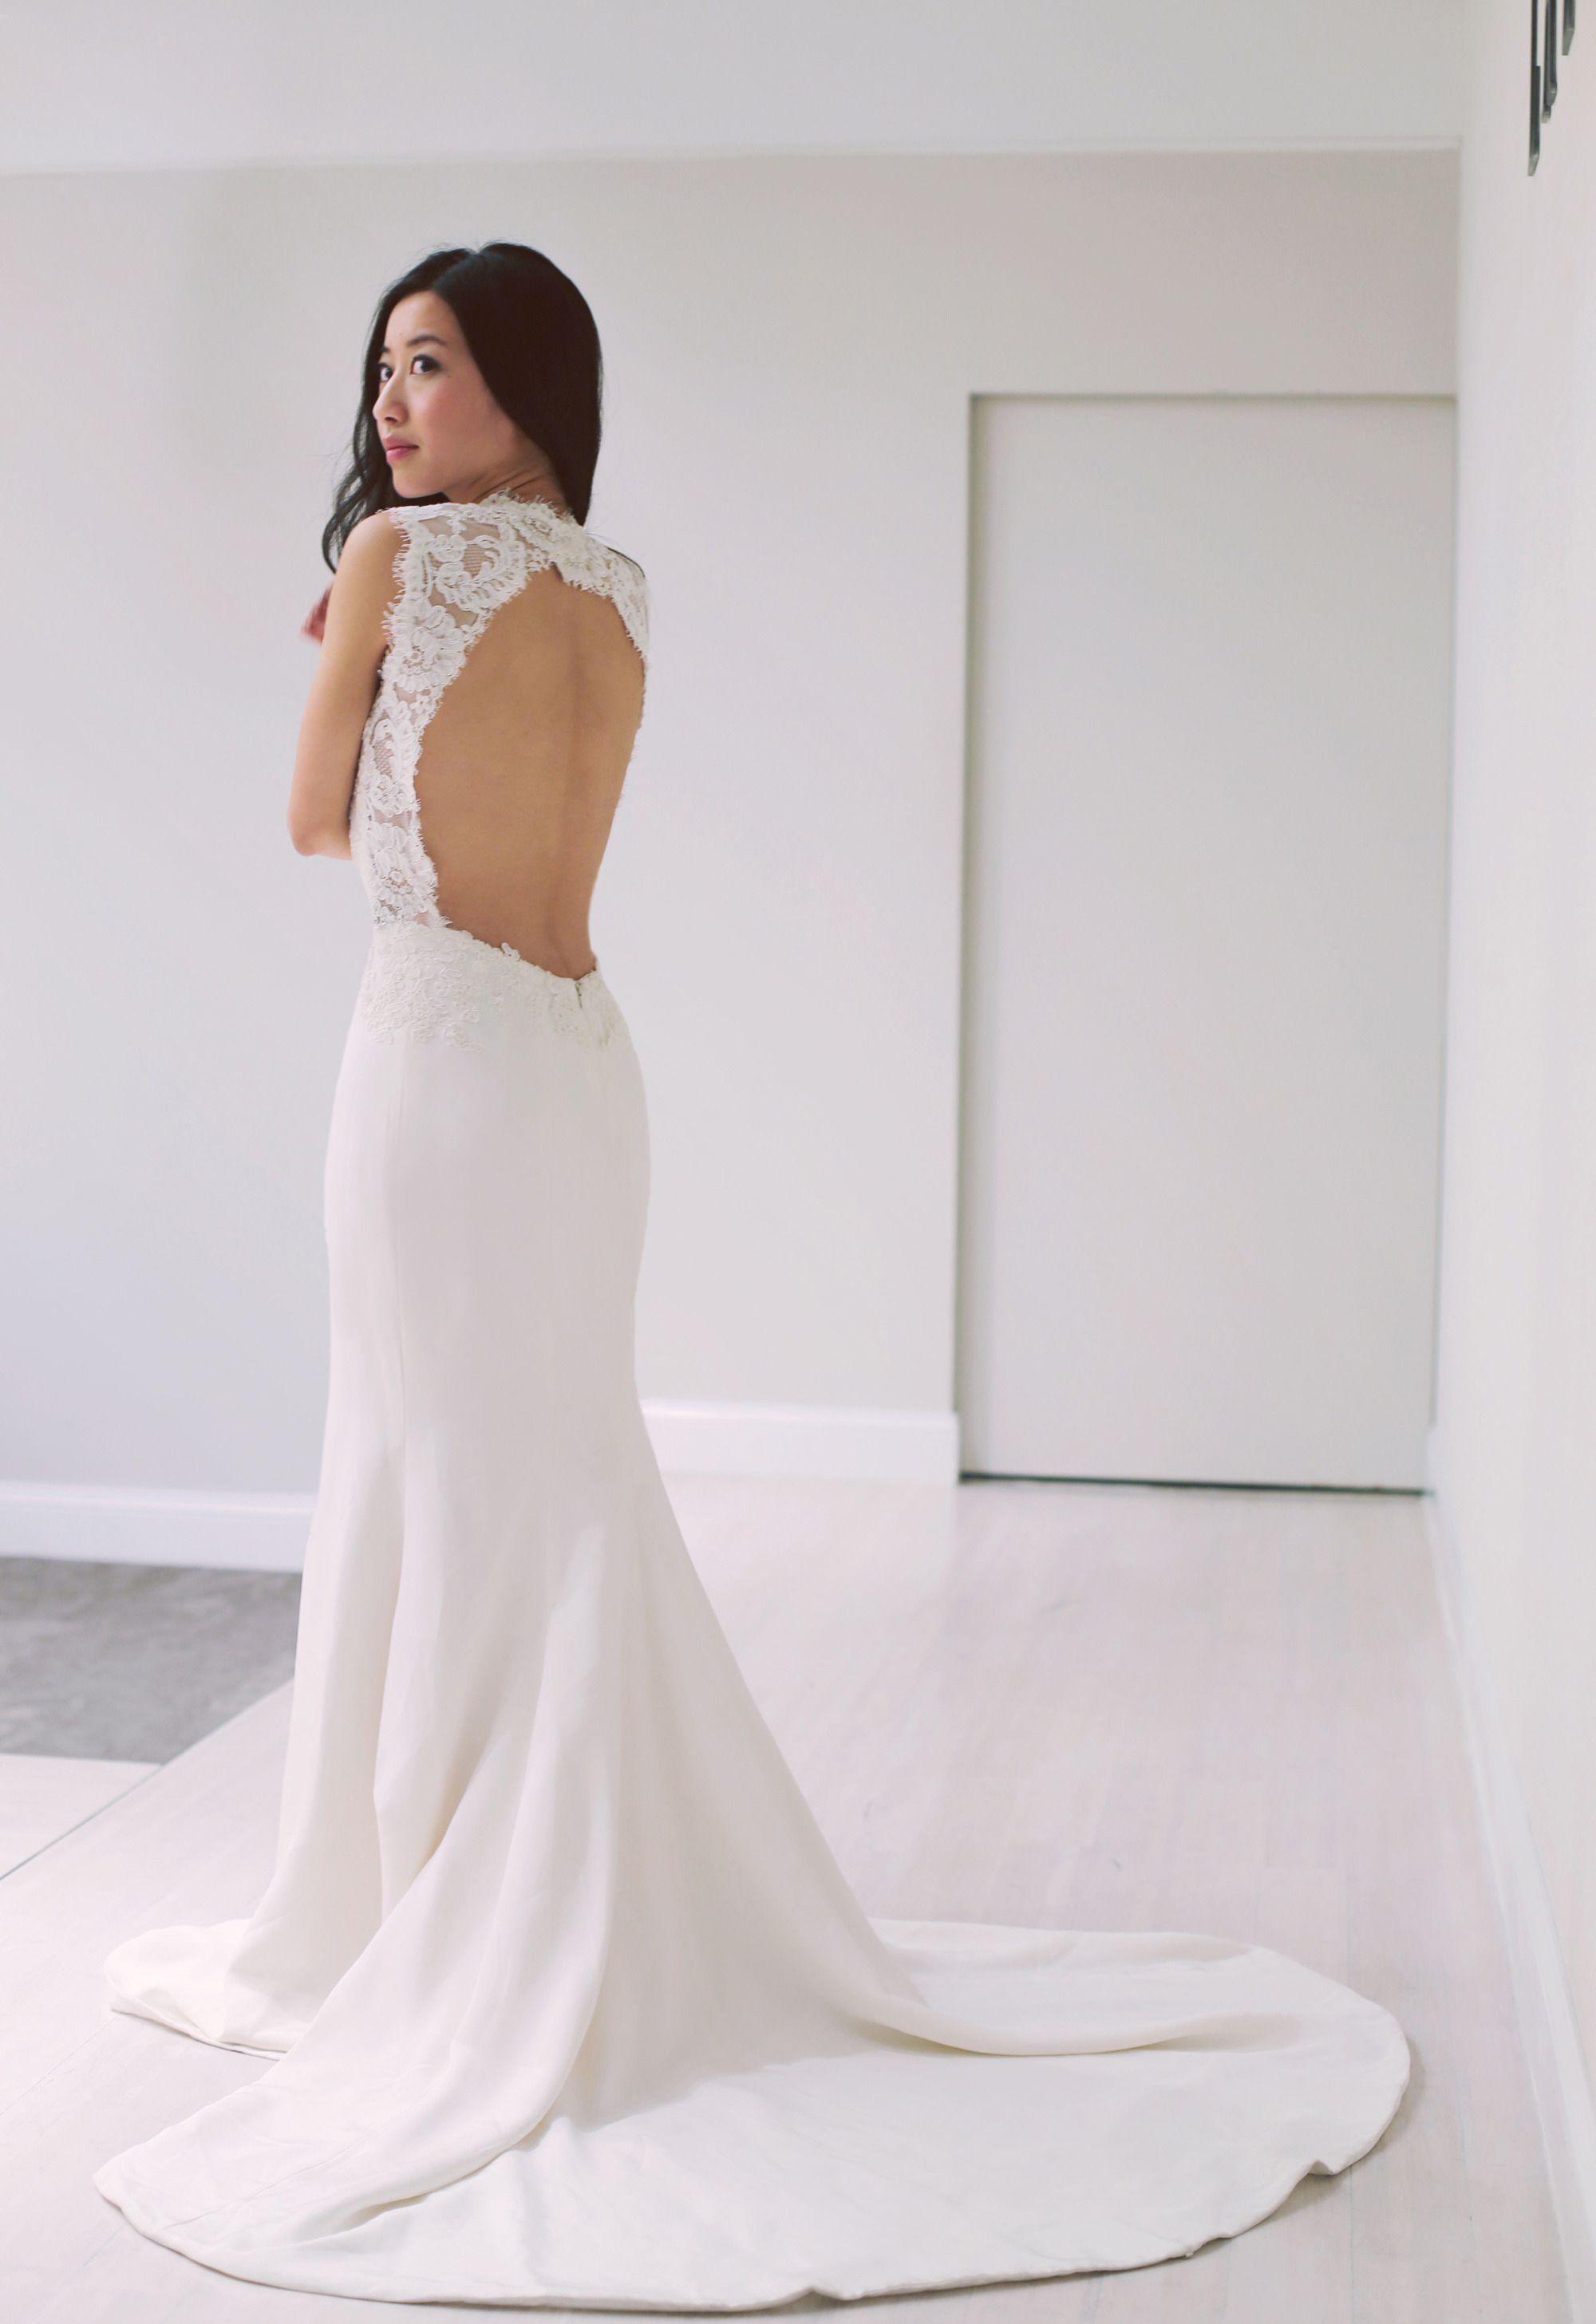 Wedding dress silhouette with extra petite extra petite dress